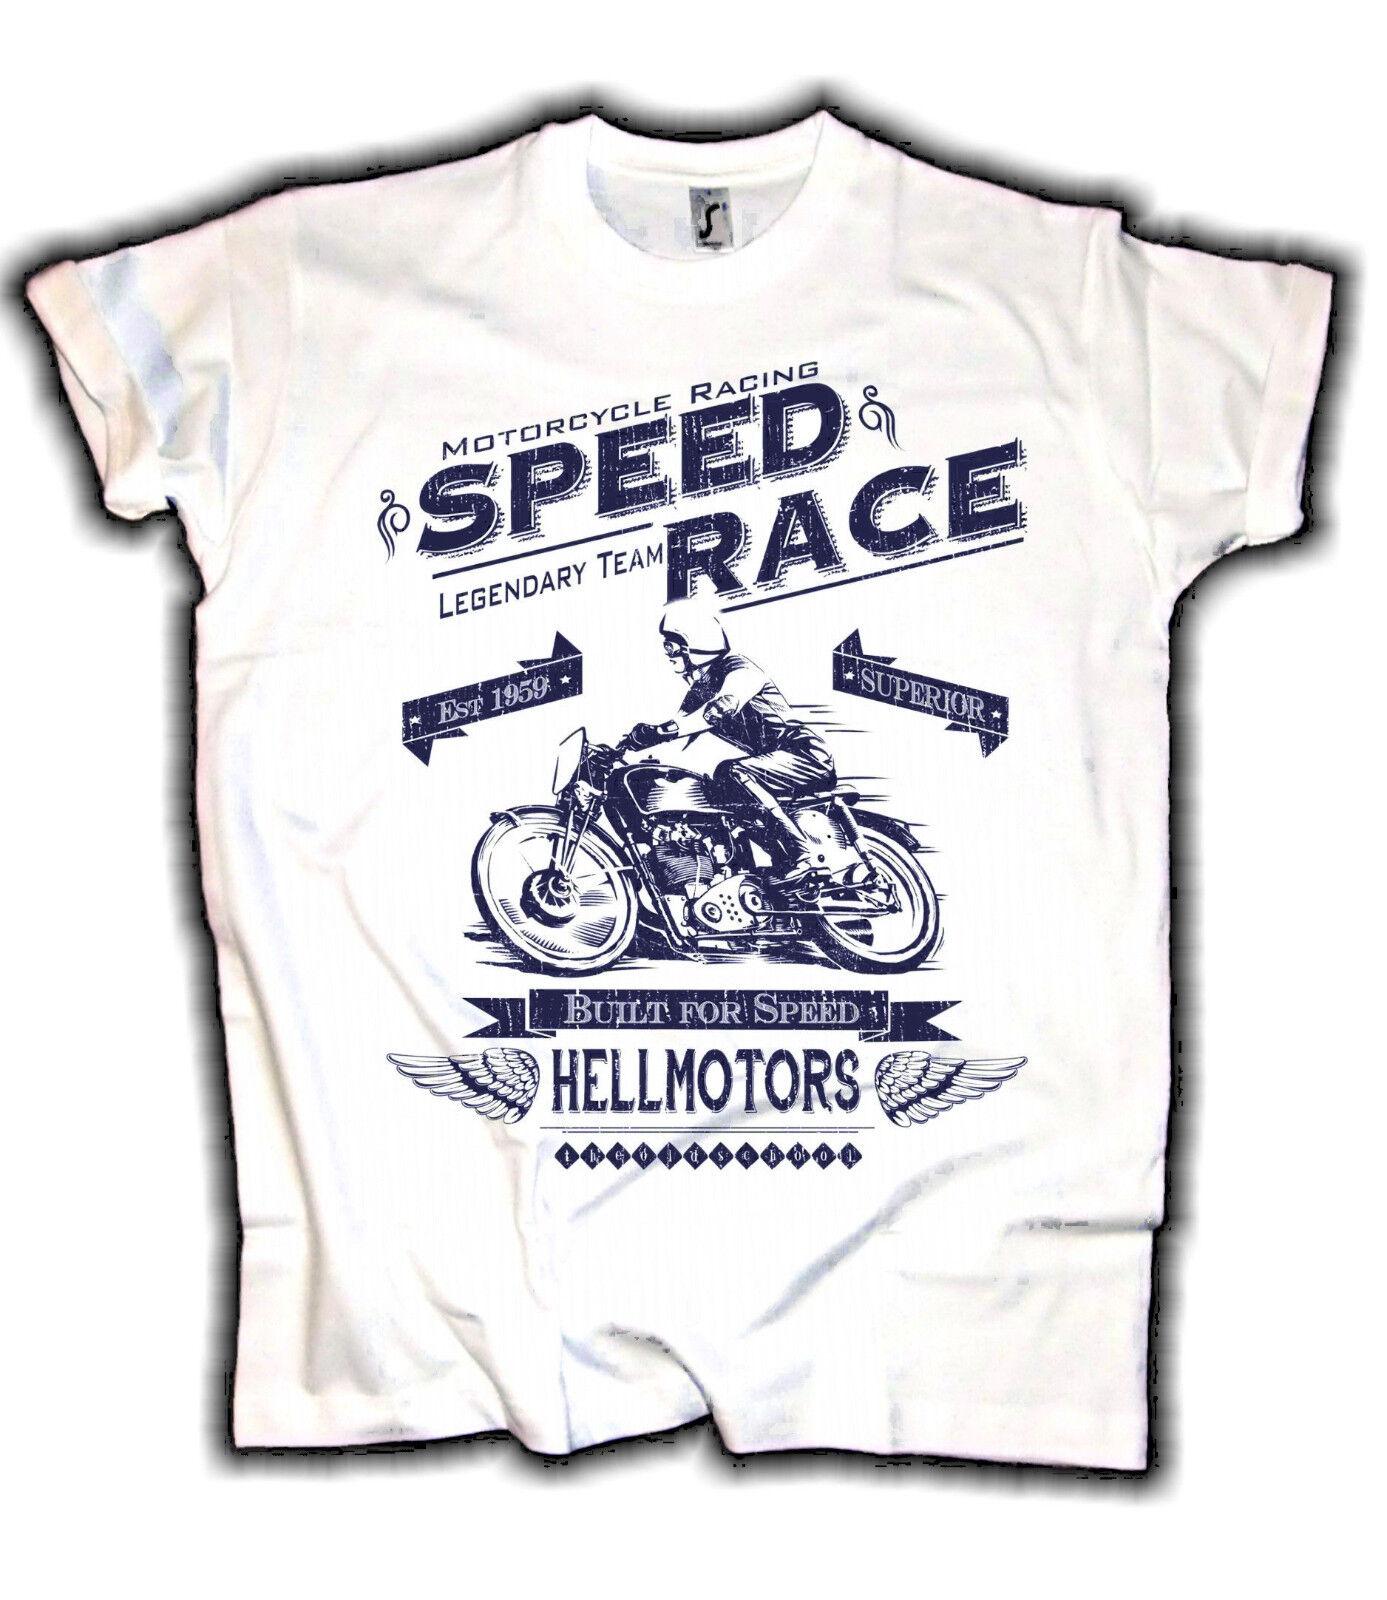 Herren Biker T-Shirt *Speed Race* Reduziert Lagerabverkauf Cafe Racer Motorrad